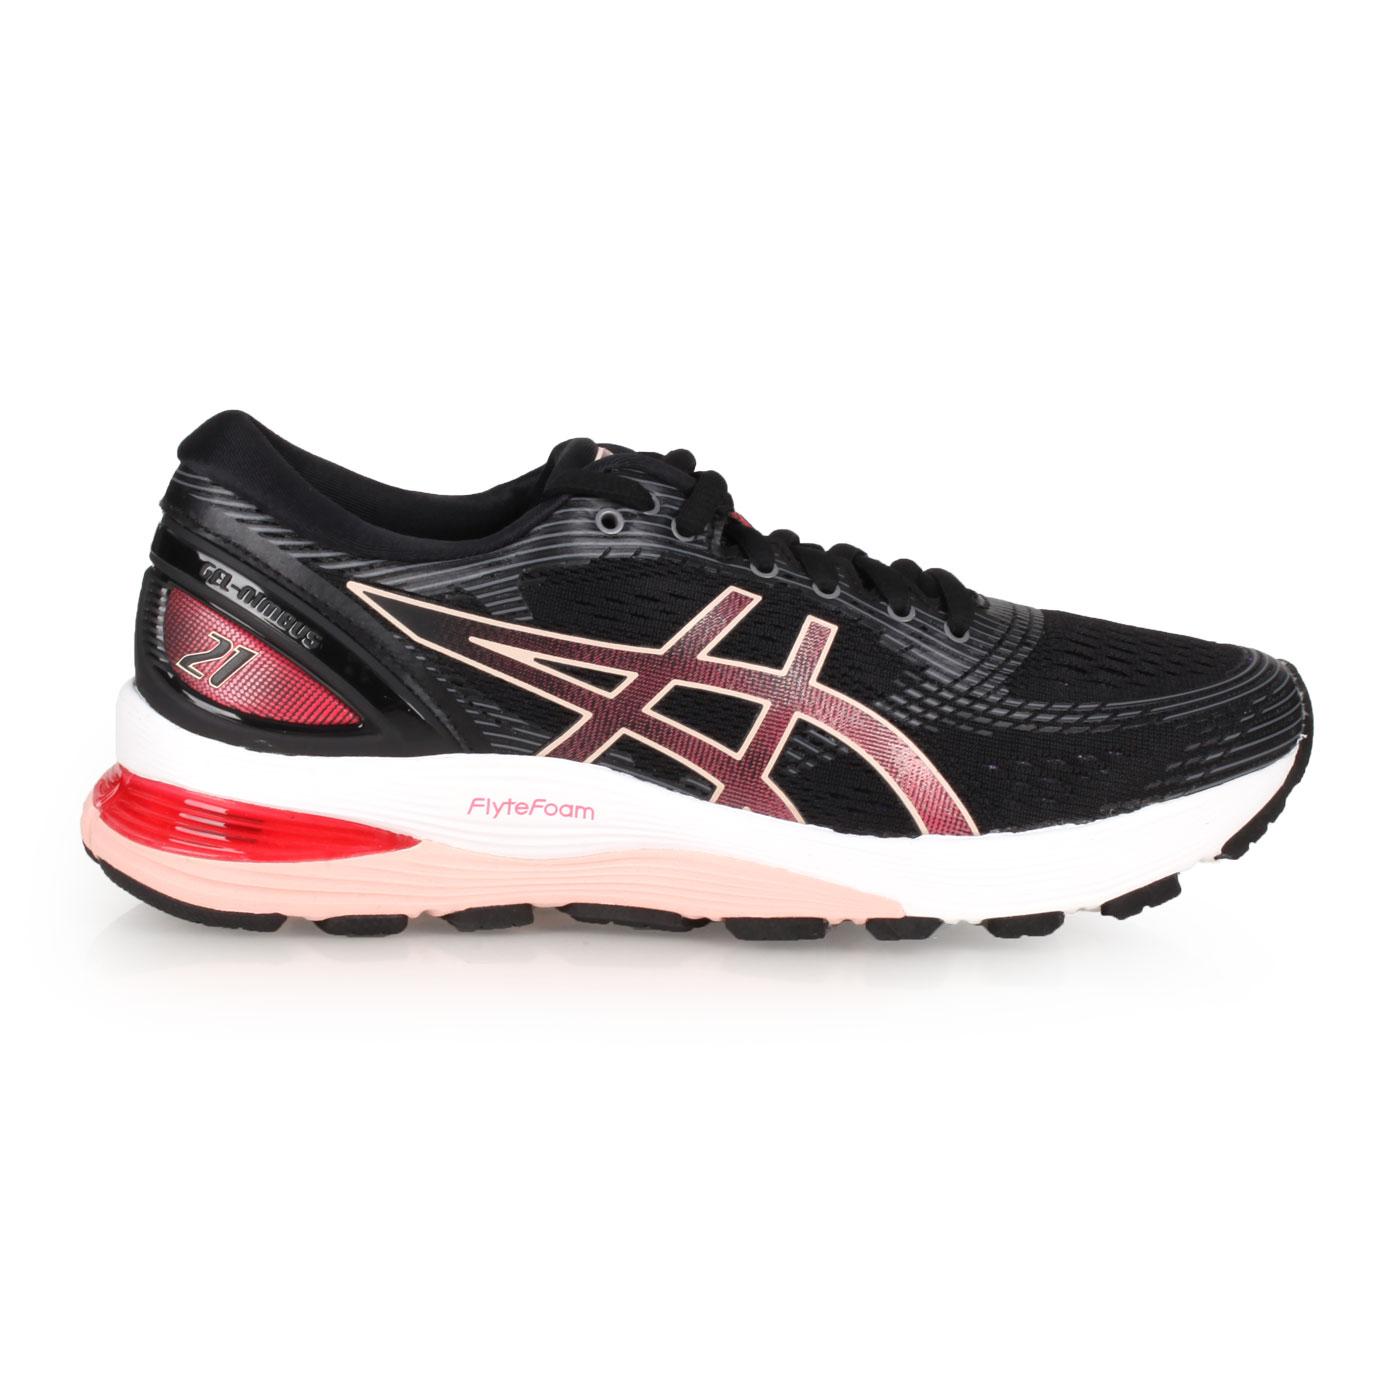 ASICS 女款慢跑鞋  @GEL-NIMBUS 21@1012A156-002 - 黑玫粉